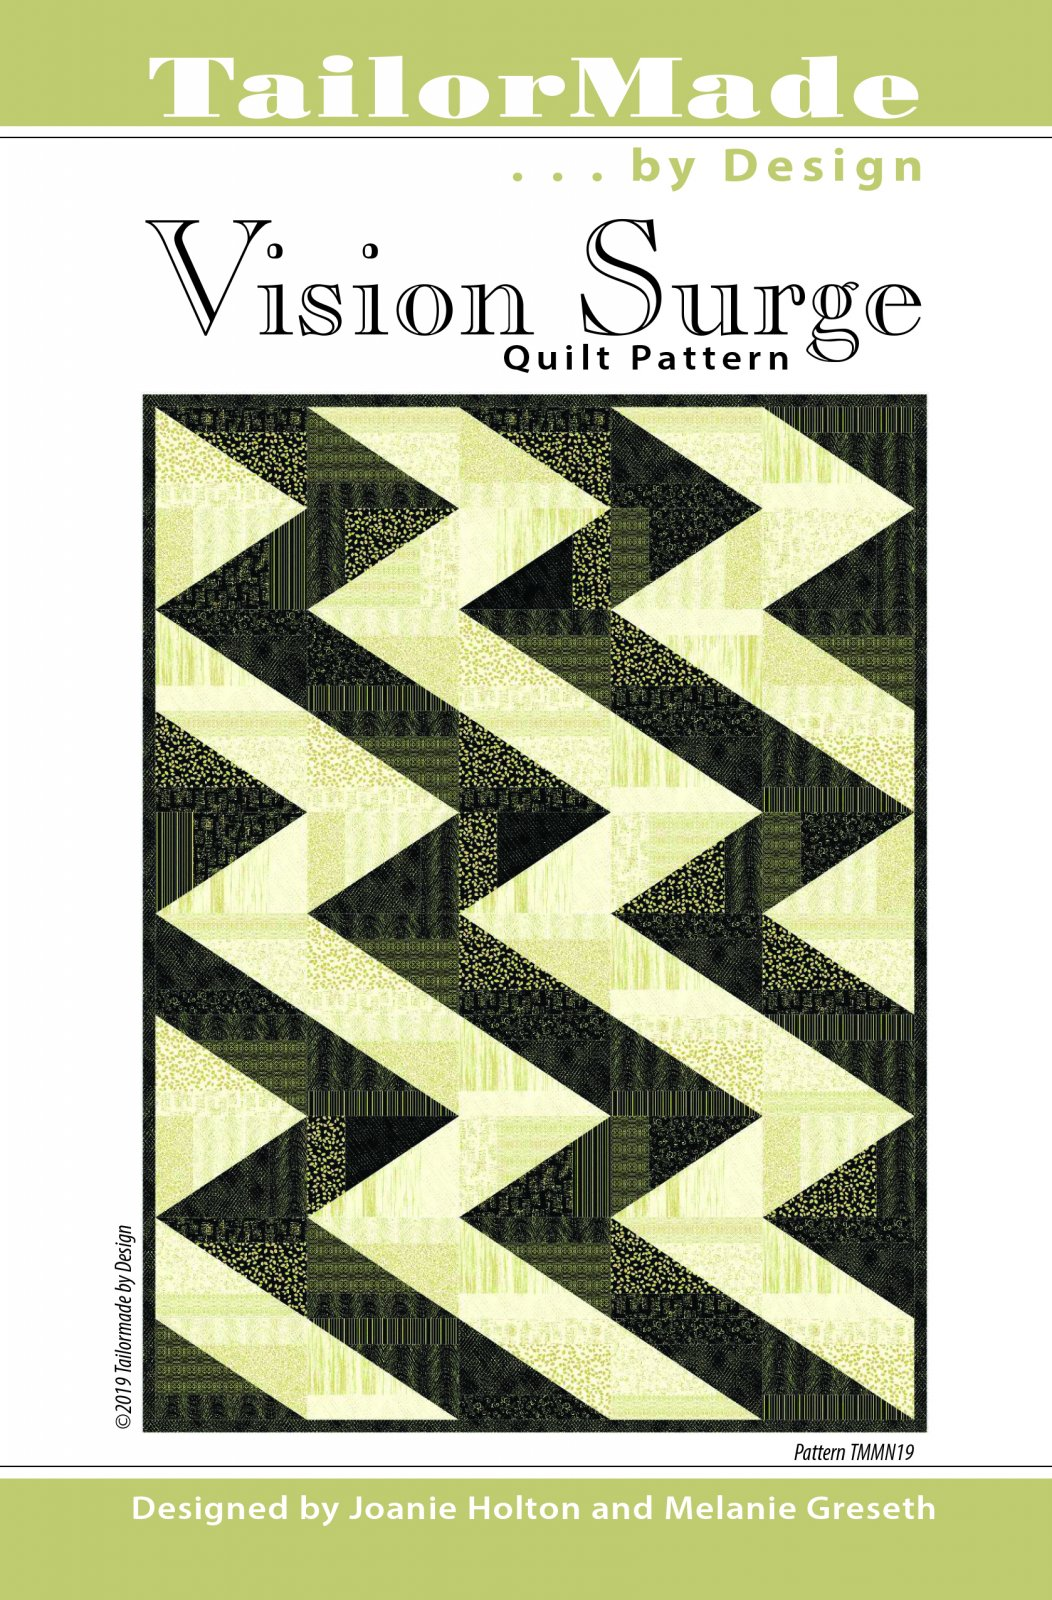 Vision Surge pattern